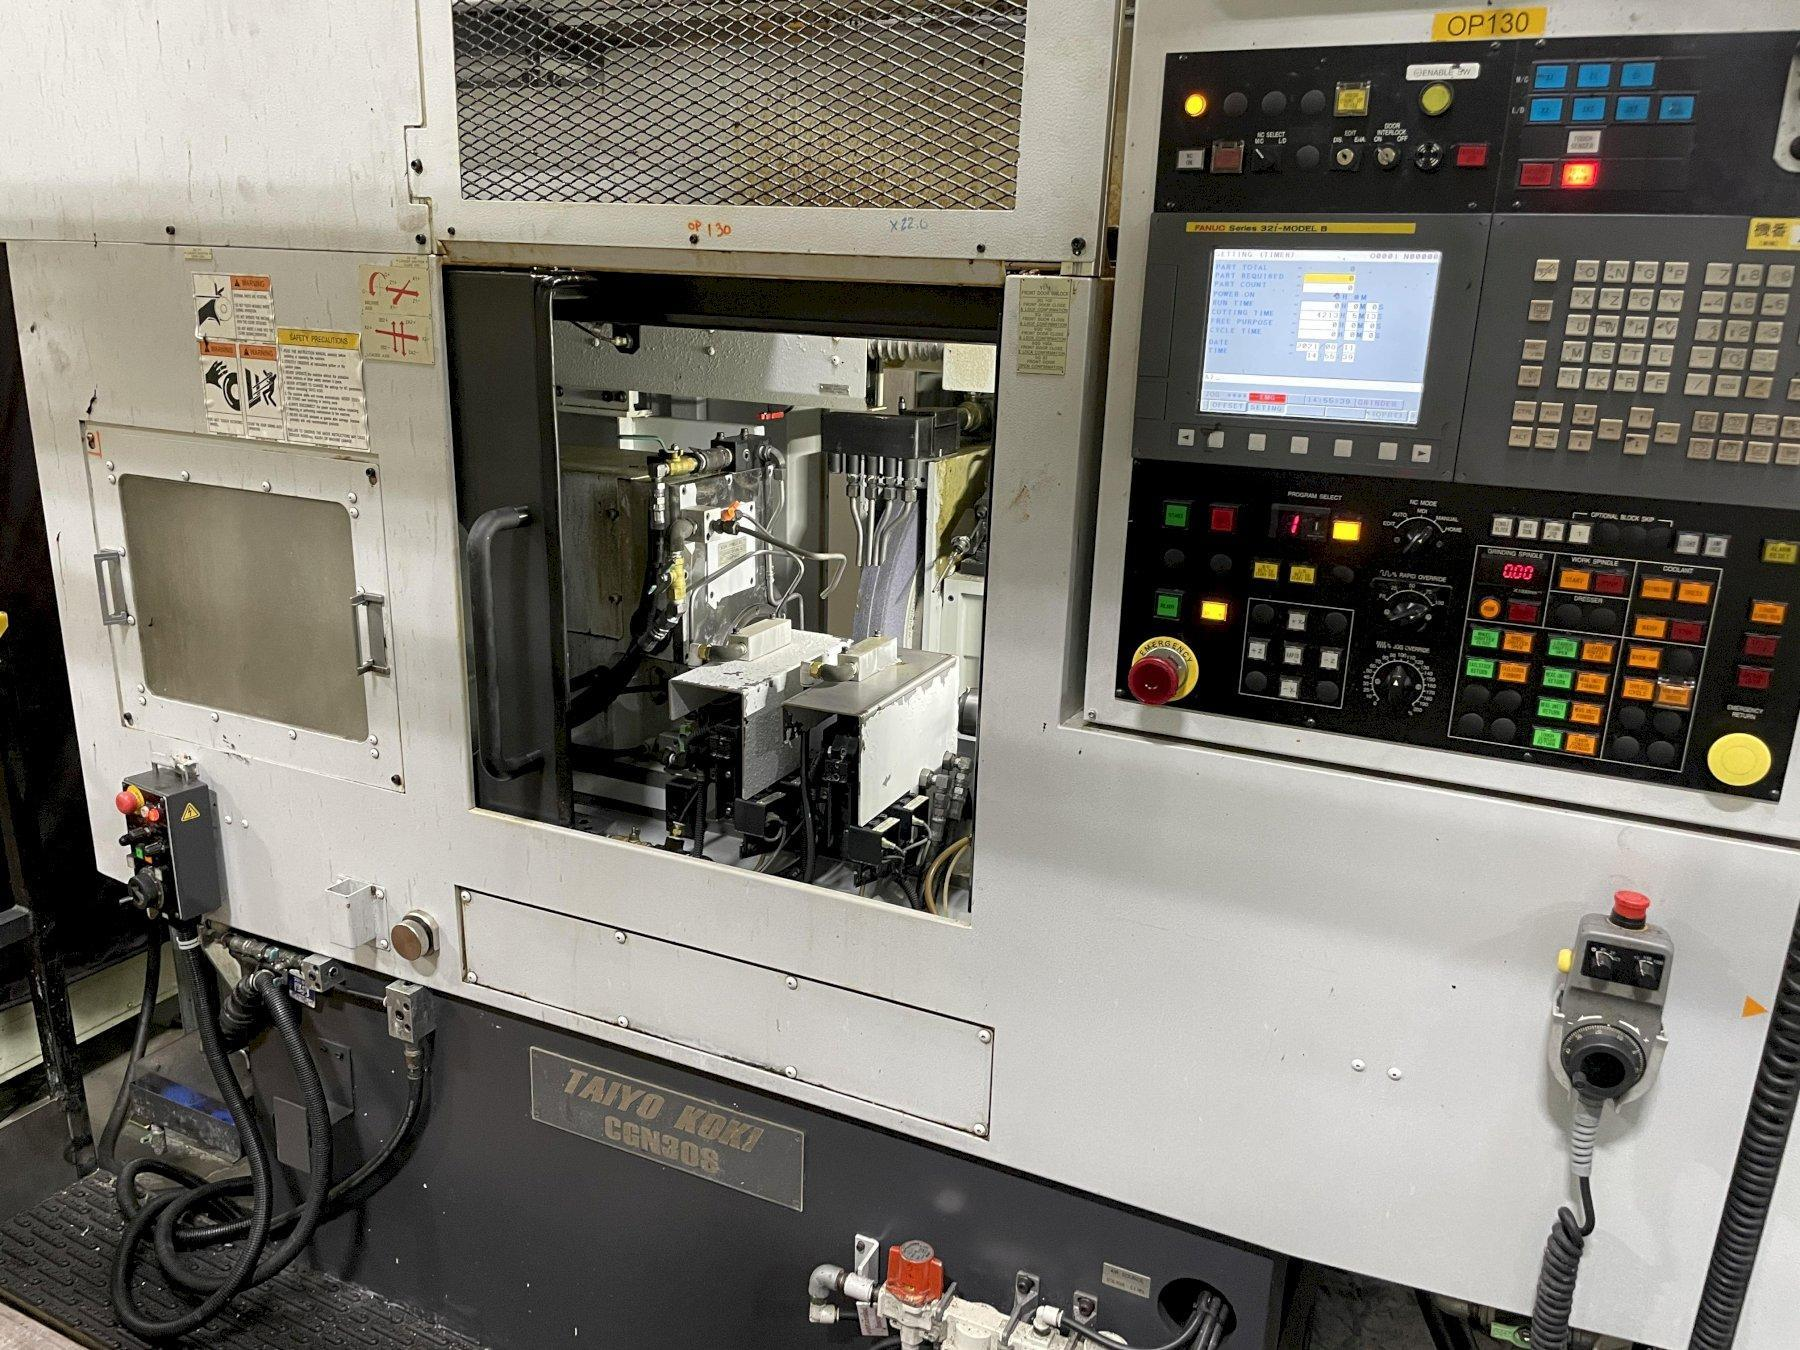 Taiyo Koki CGN30S CNC Cylindrical Grinder